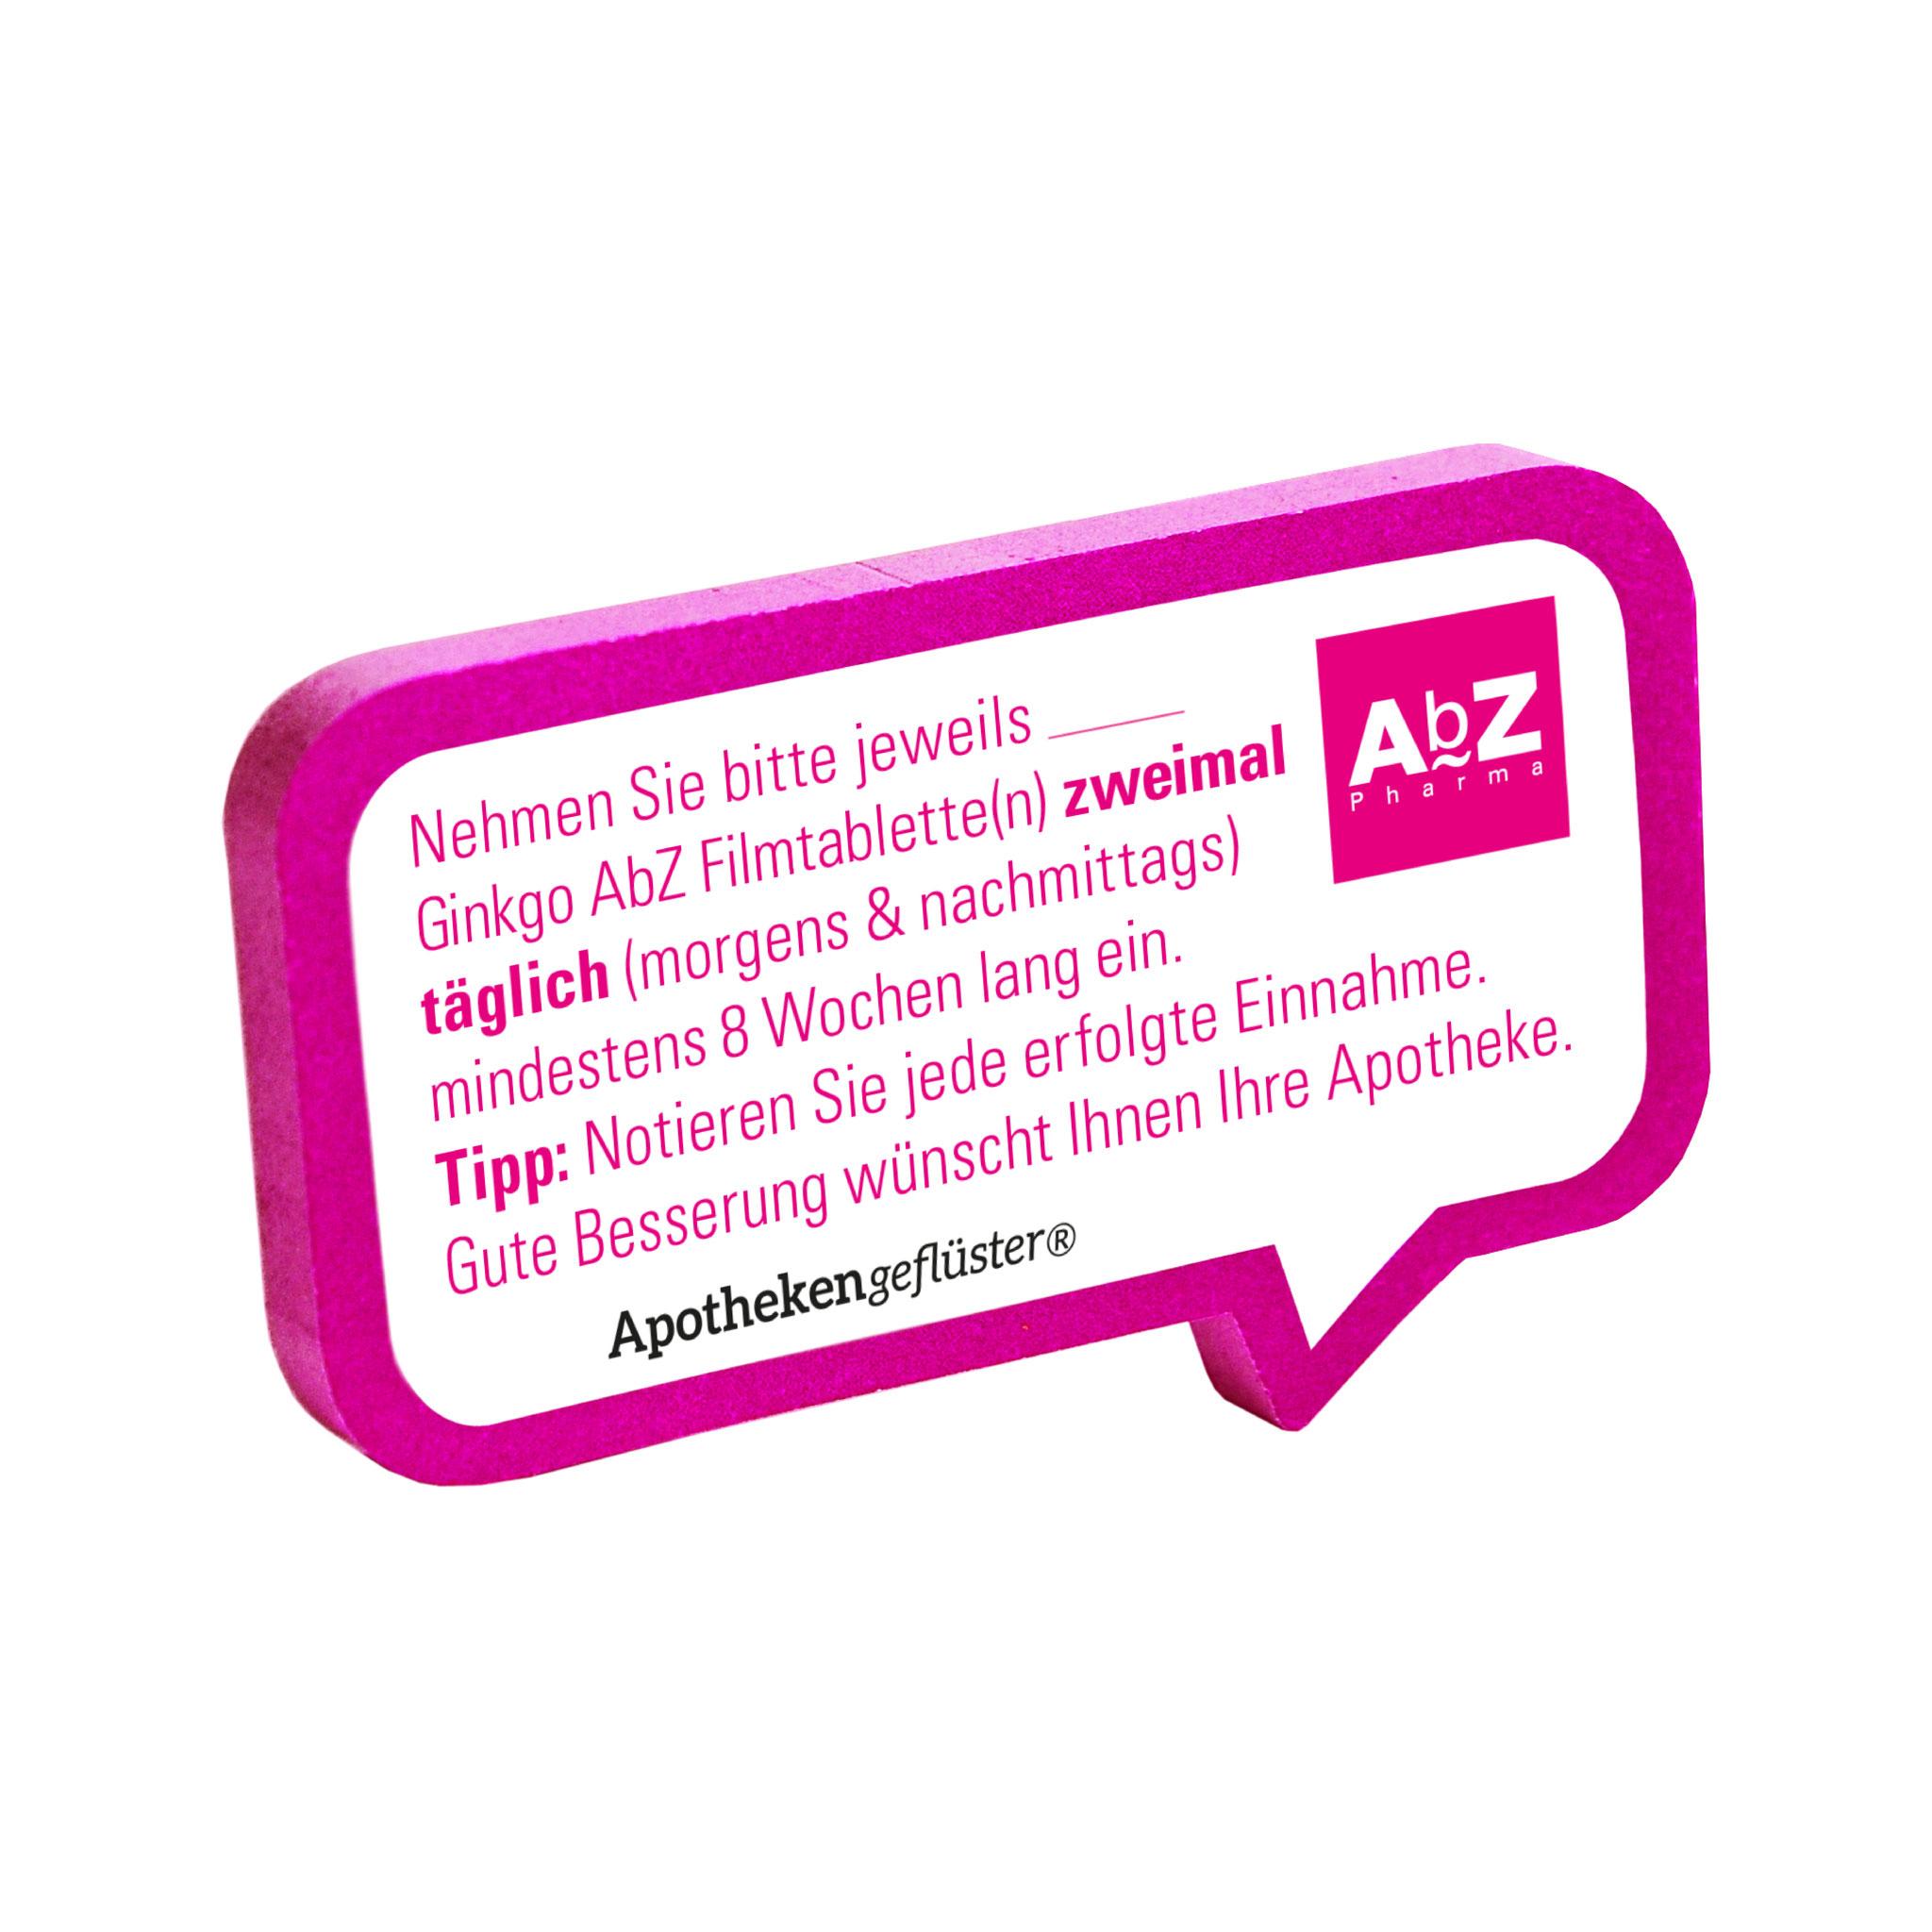 Apothekengeflüster_AbZ Pharma_Beratungssticker Ginkgo_Stickerblock